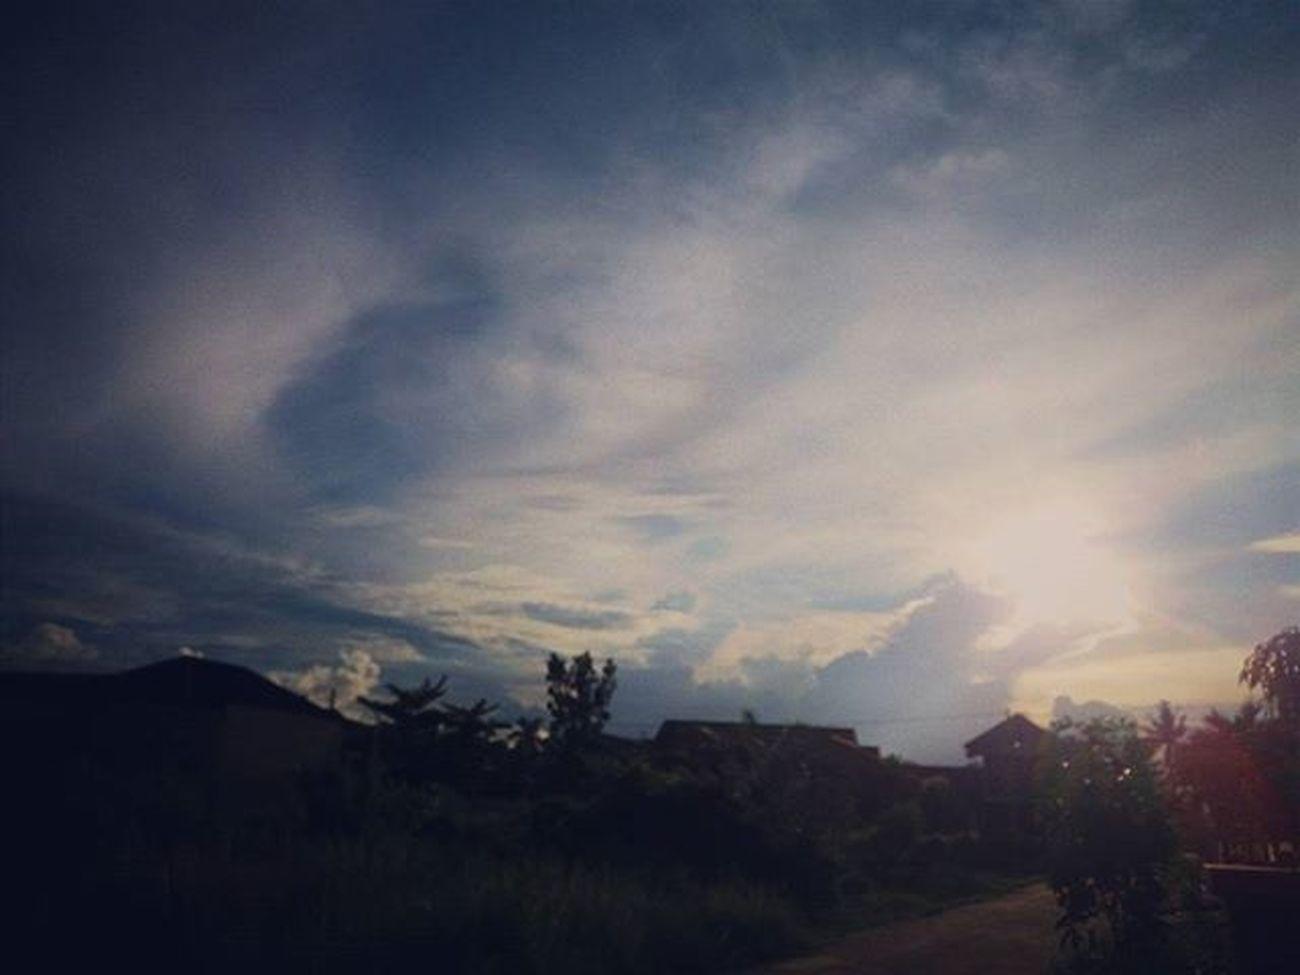 Lagi dan lagi Vscocam Latepost Repost Pekanbaru Riau INDONESIA Indovidgram Cantikindonesi Sunset Sunrise Summer Amazing WOW World Russia End SamsungJ5 Samsung